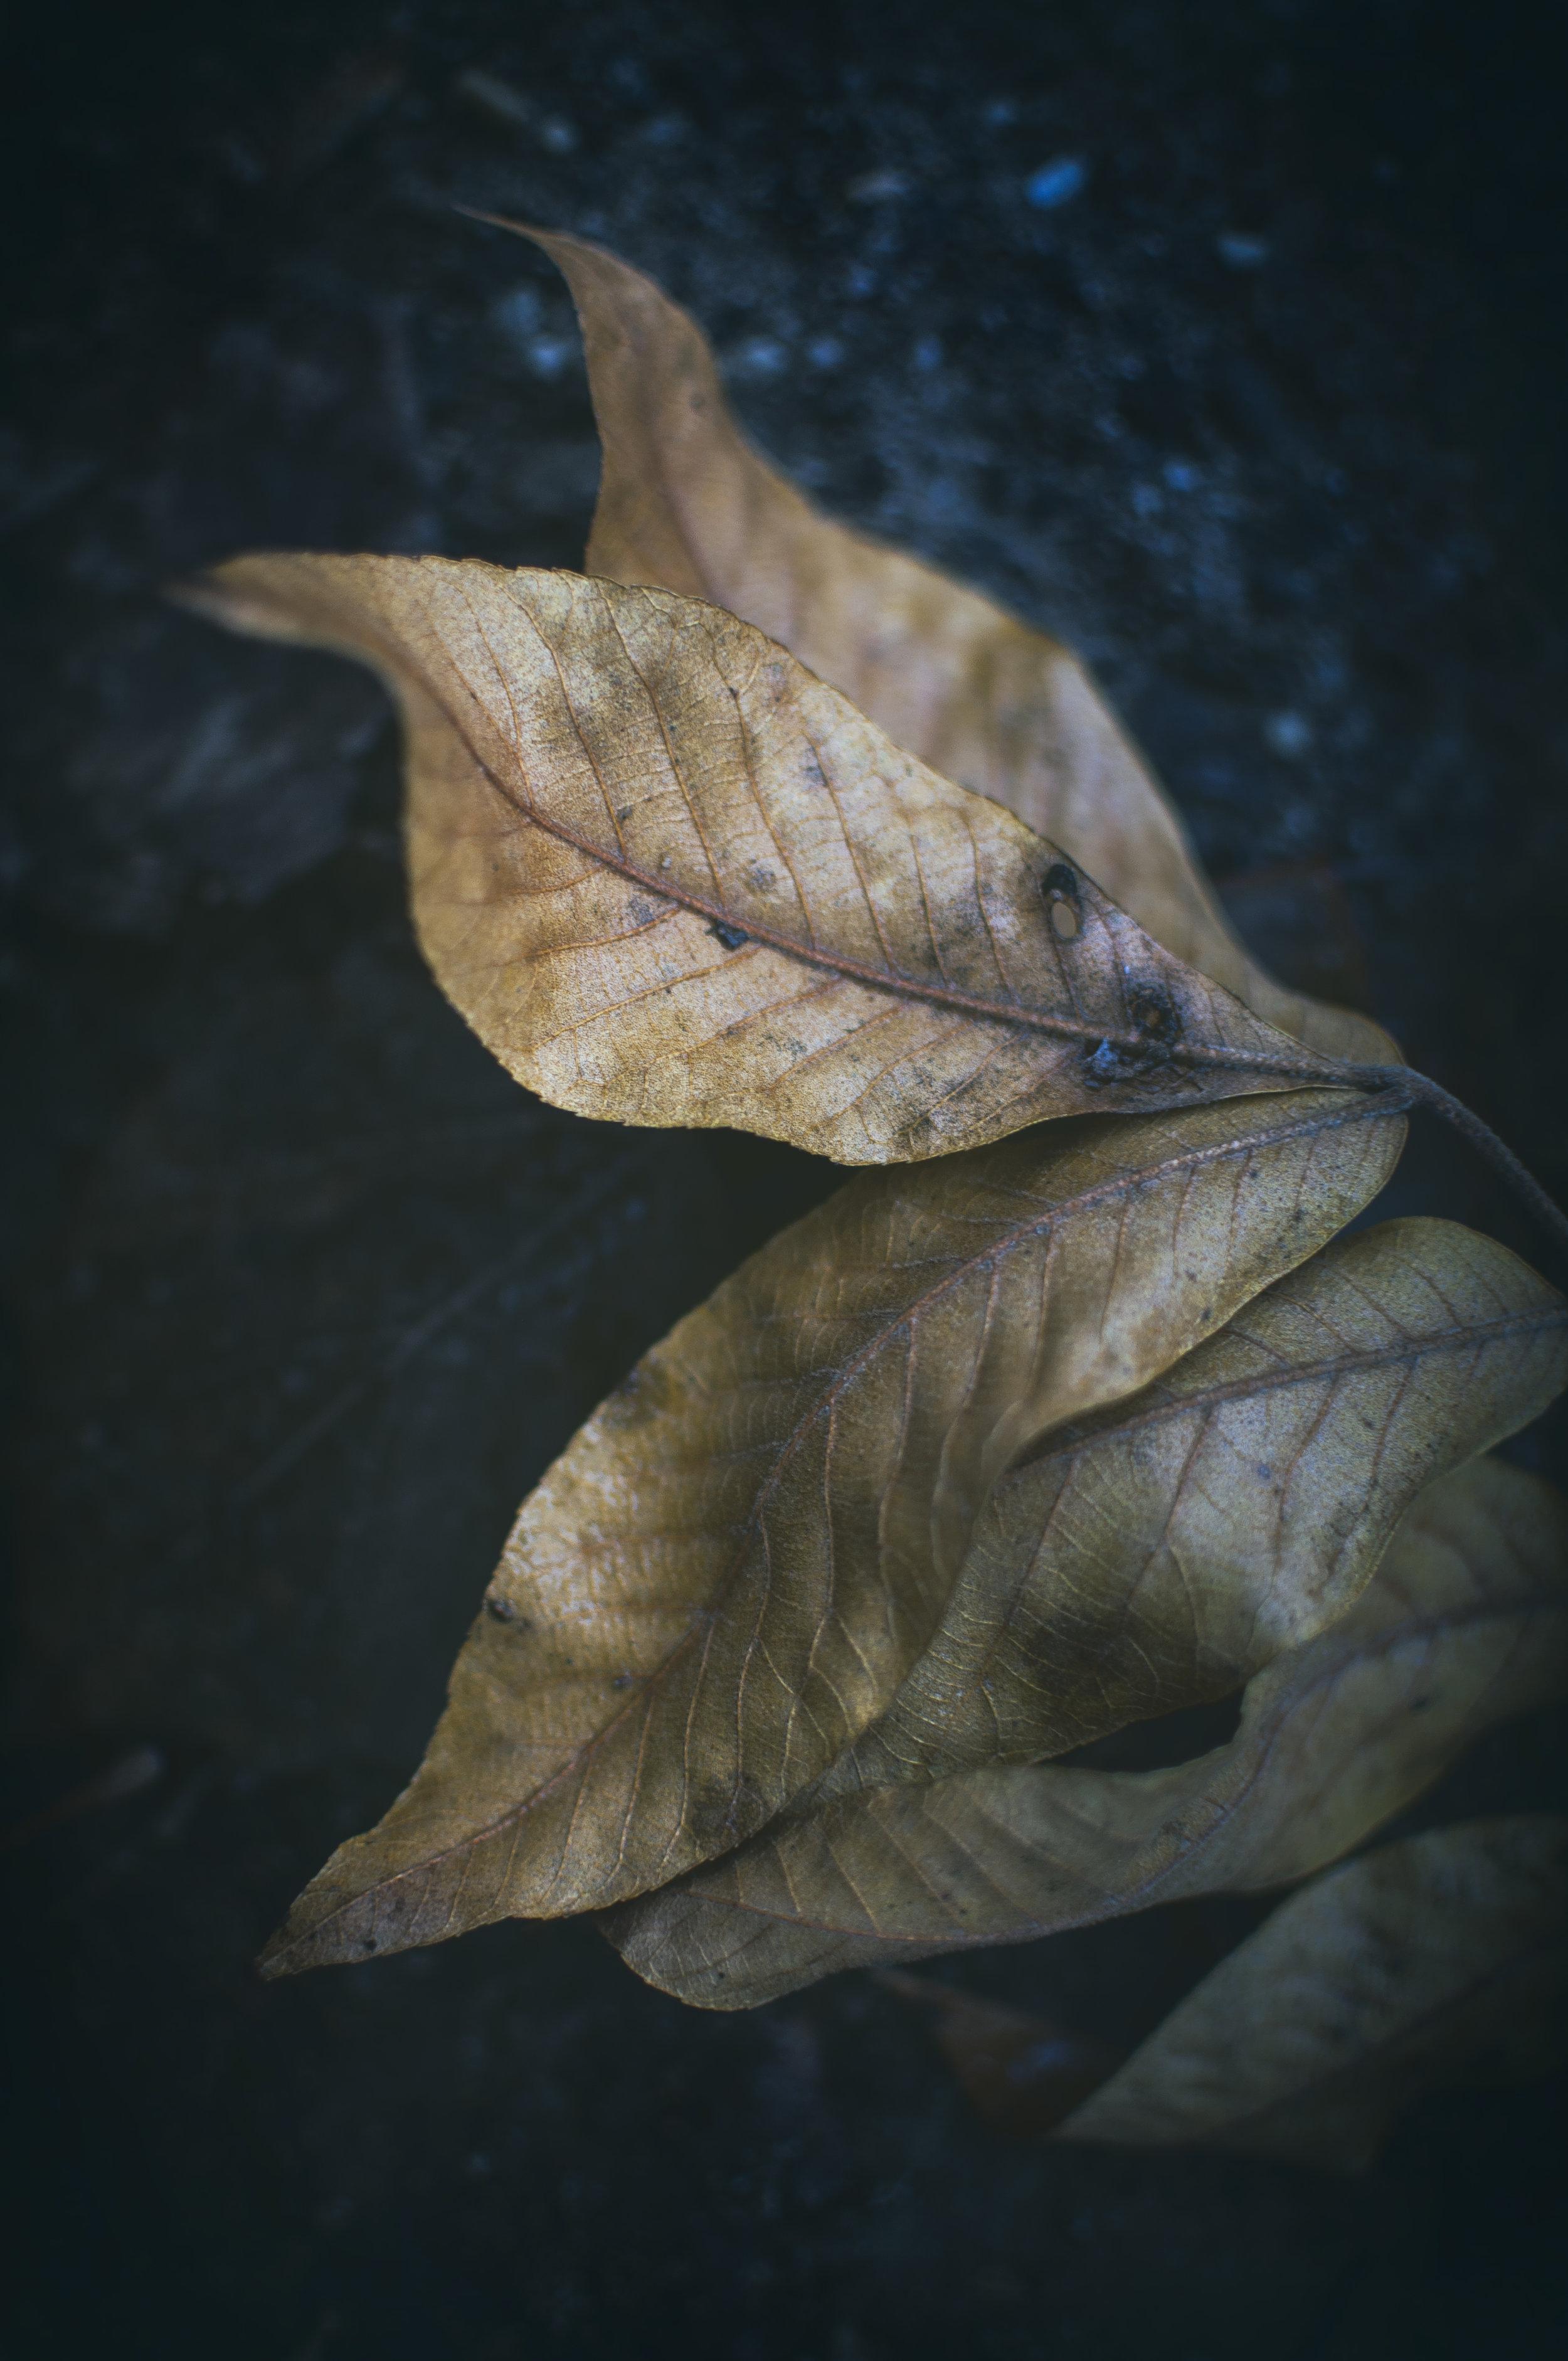 Nature_Detail_Leaf002.jpg